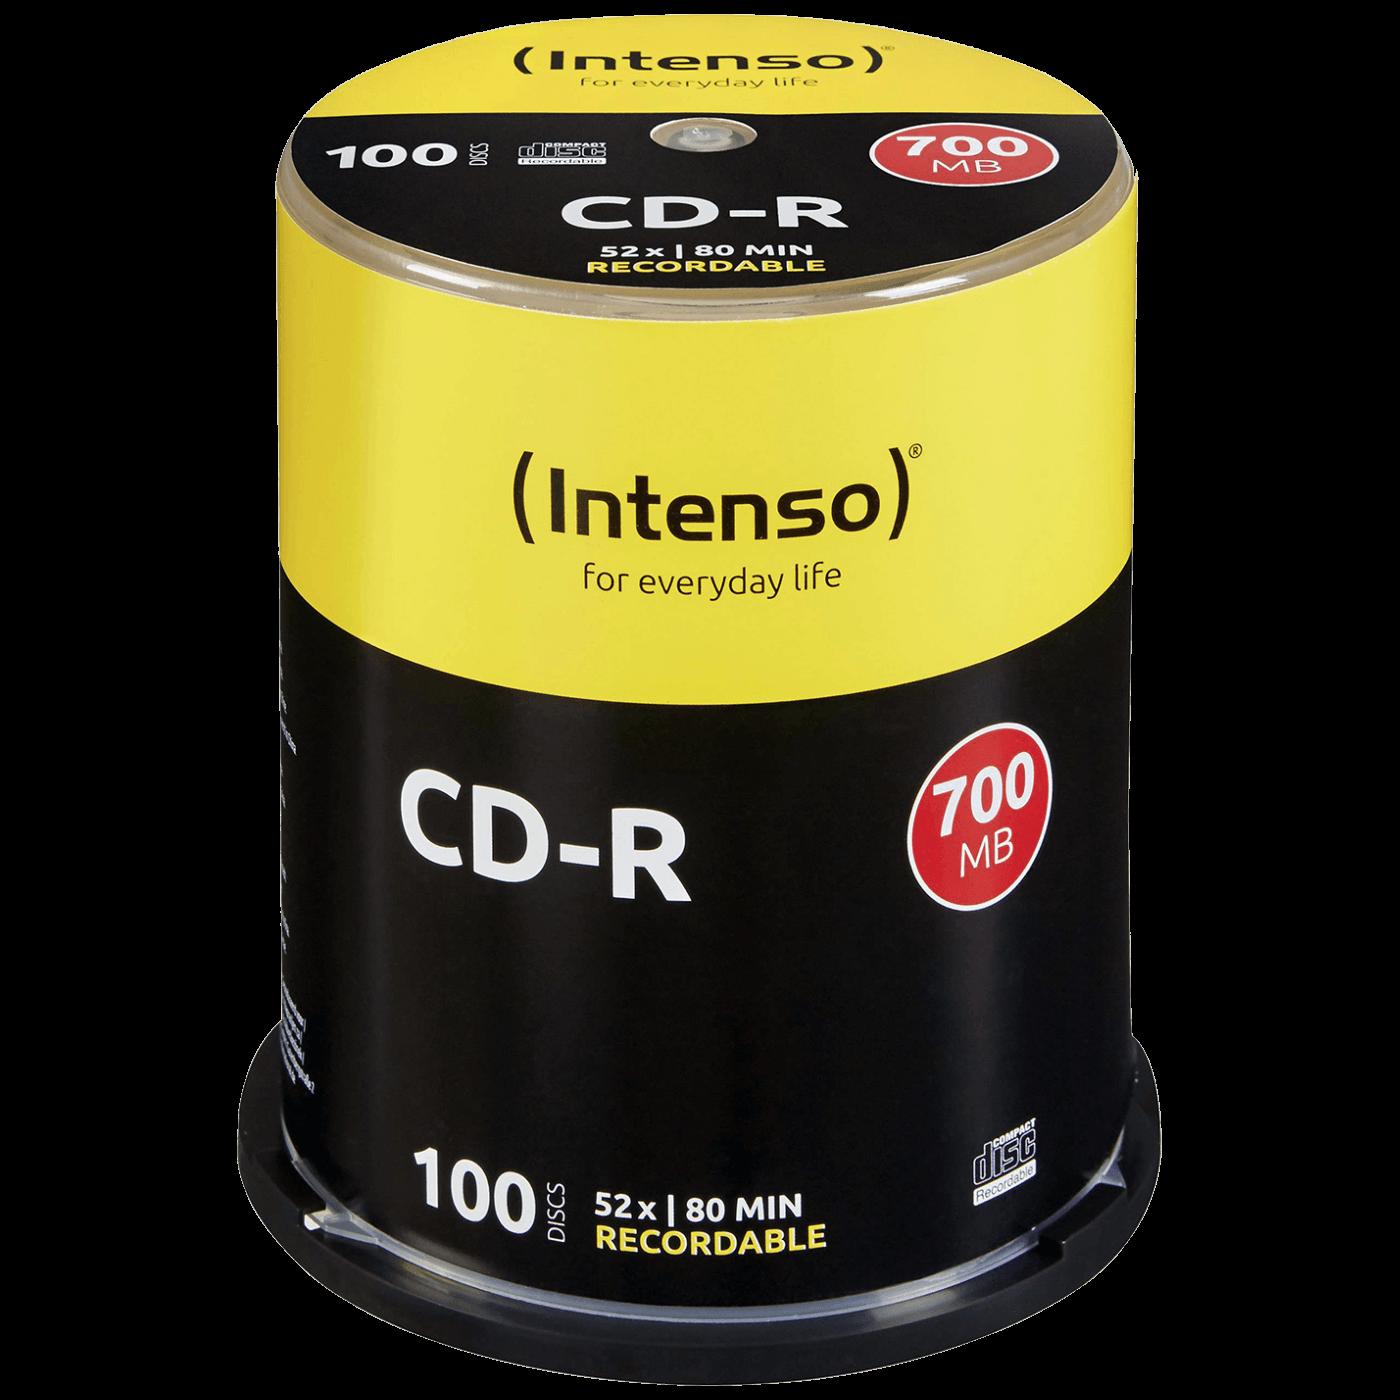 CD-R 700MB (80 min.) pak. 100 komada Cake Box